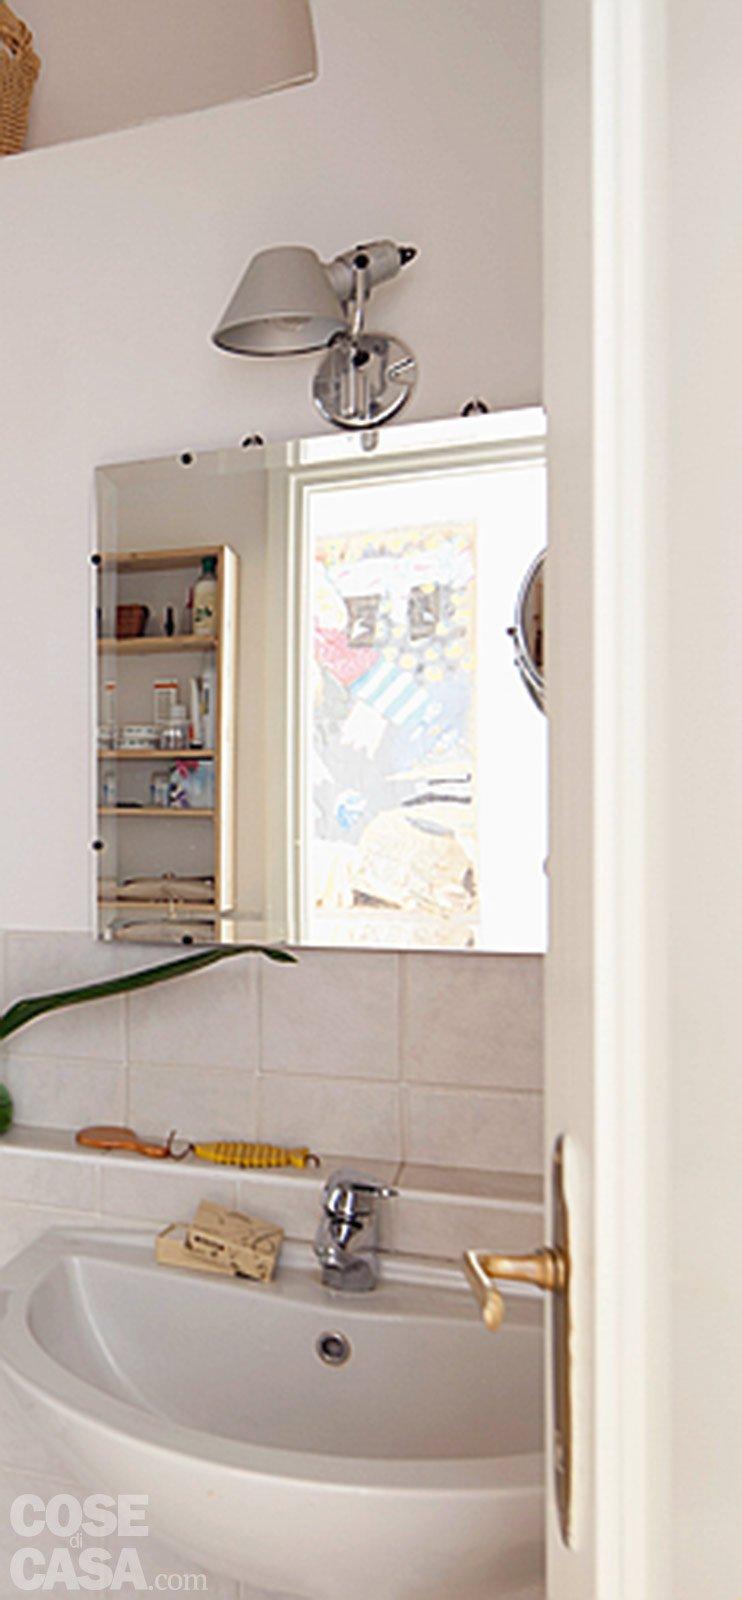 Bilocale di 40 mq una casa fai da te cose di casa - Arredare bagno 4 mq ...